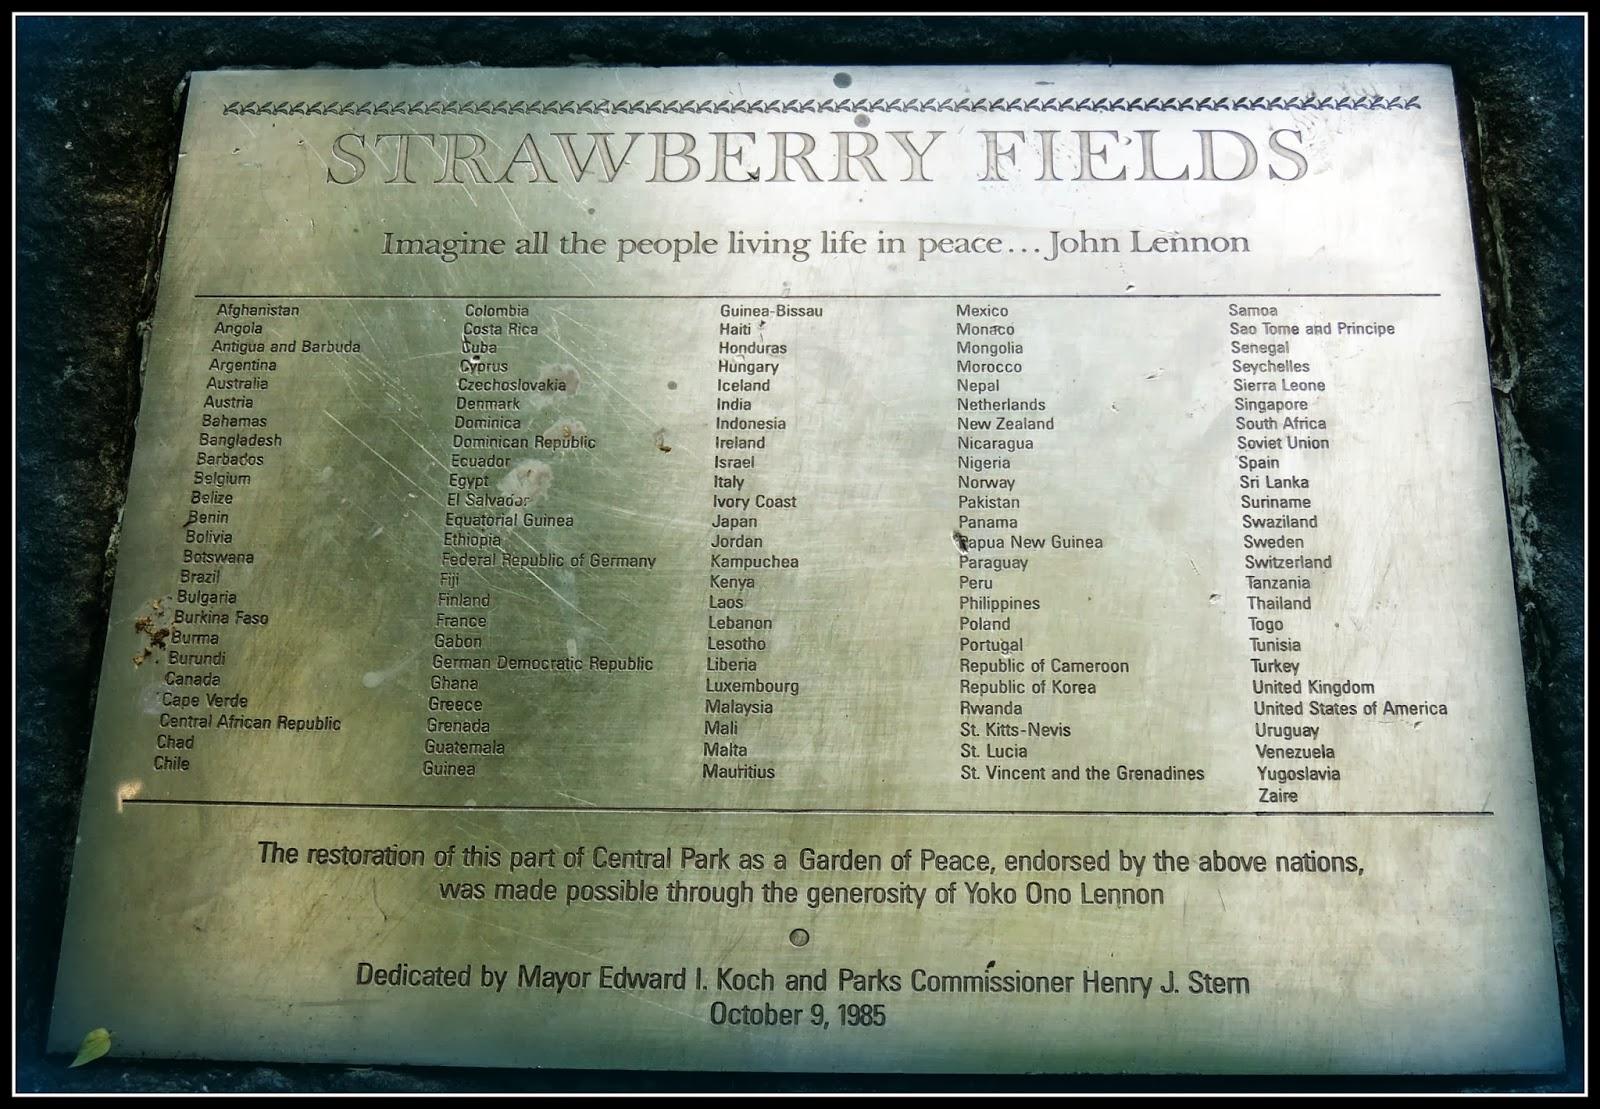 NY en 3 Días: Strawberry Fields en Central Park